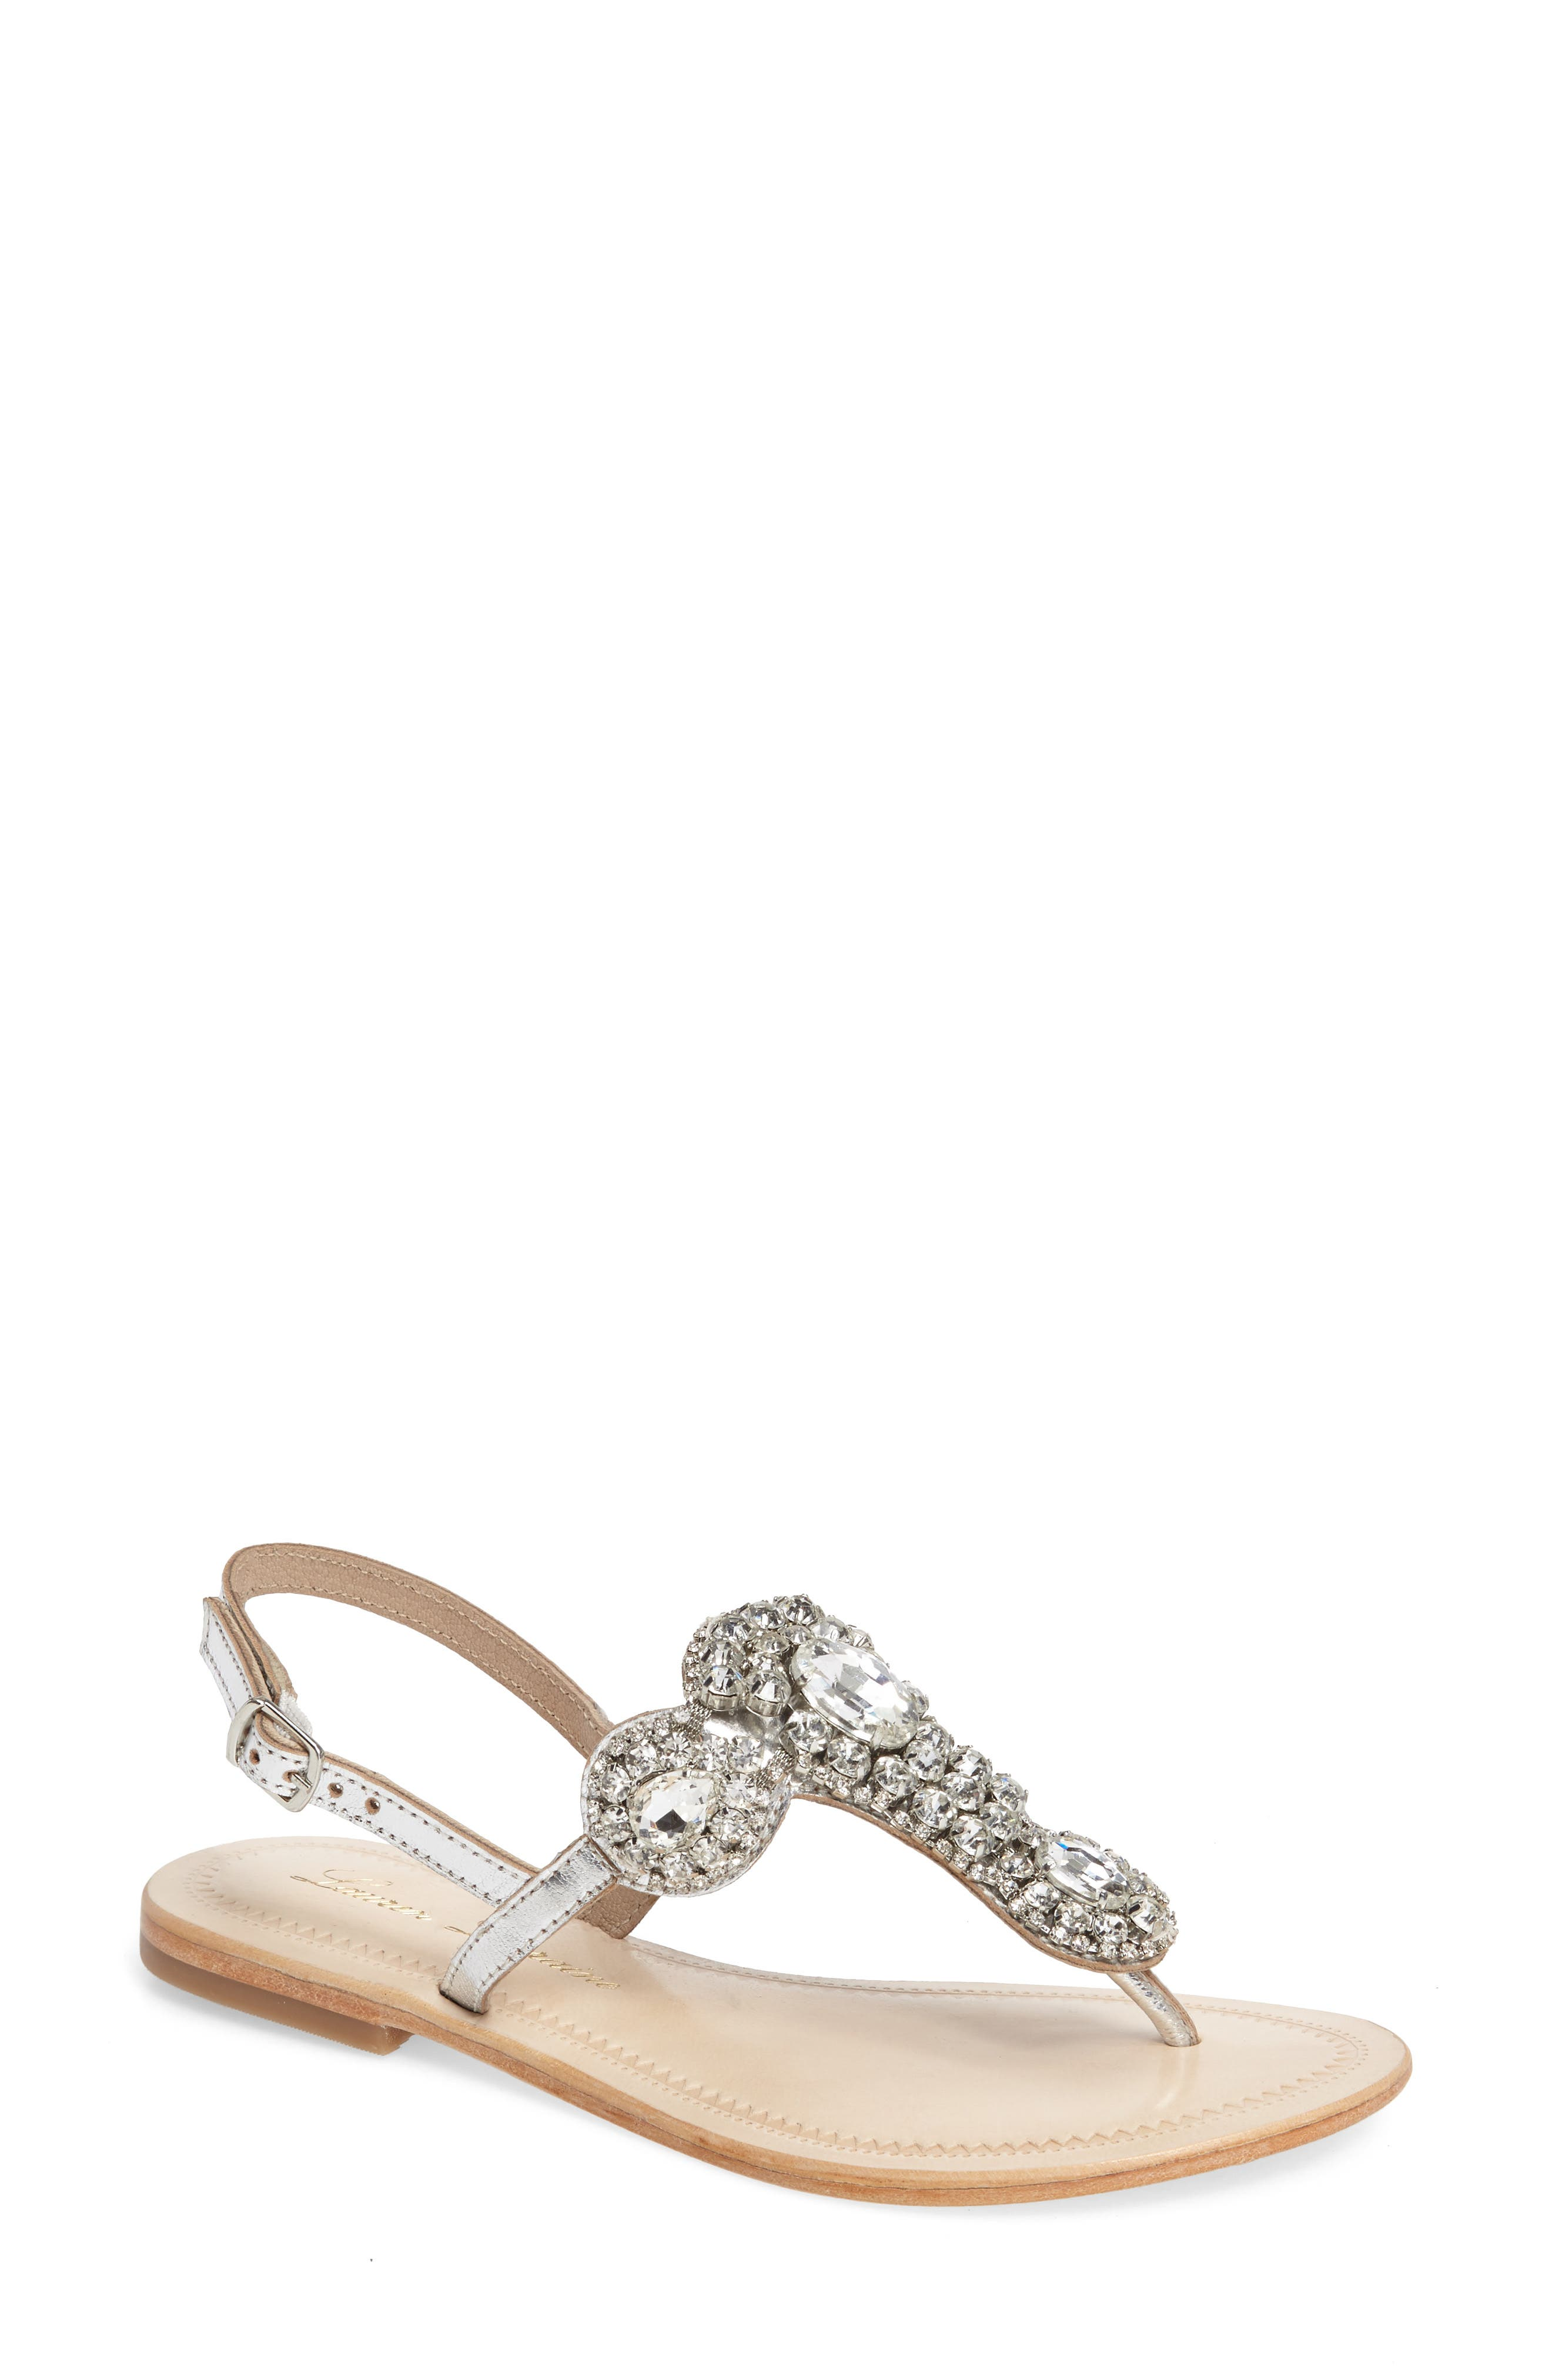 Main Image - Lauren Lorraine Bahama Crystal Embellished Sandal (Women)